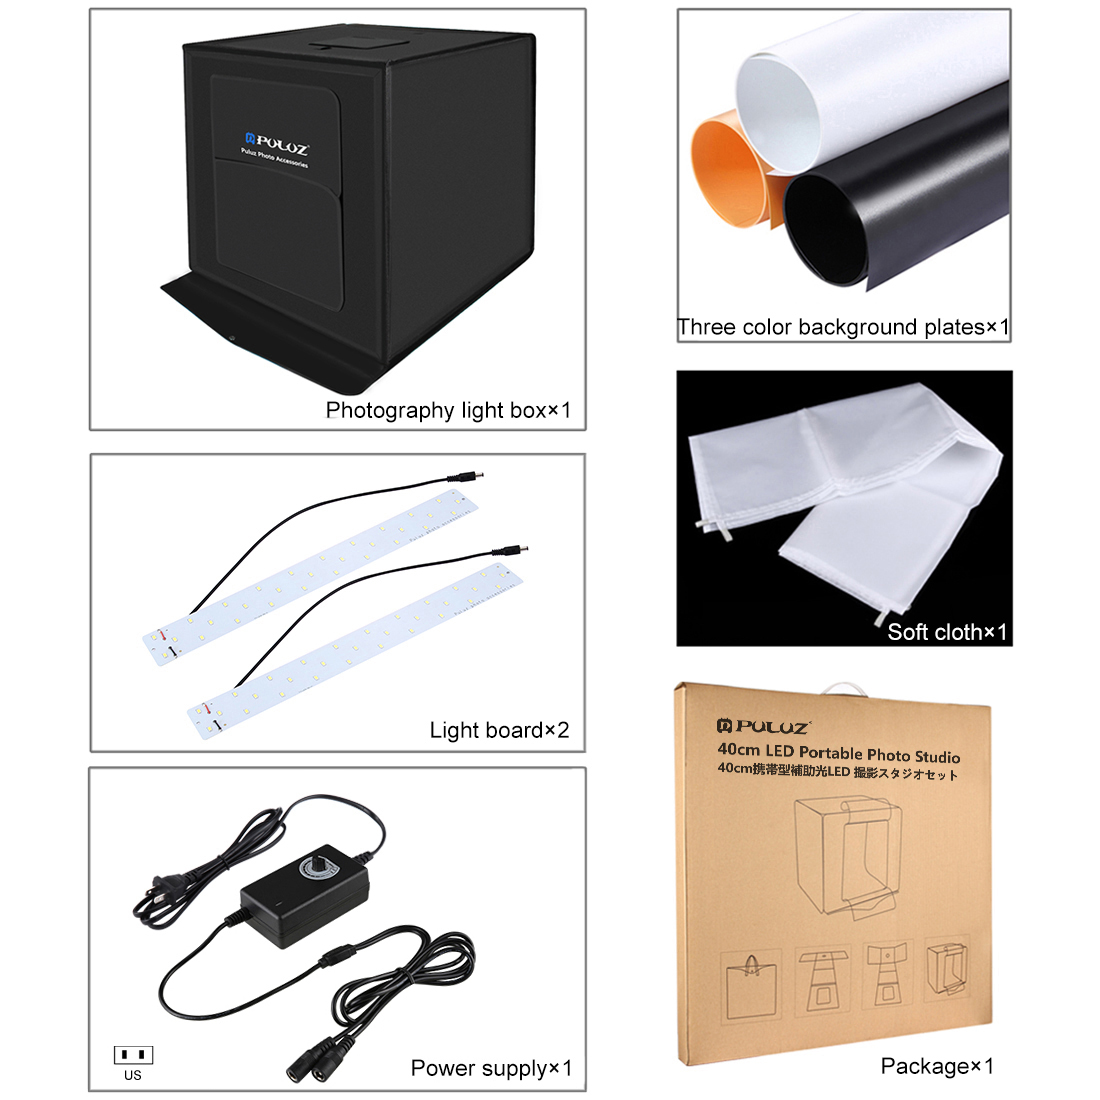 40cm Mini Photography Stutio LED Light Softbox Portable Desktop Soft box +US Plug + 3 Pieces Background Accessories + Soft Cloth